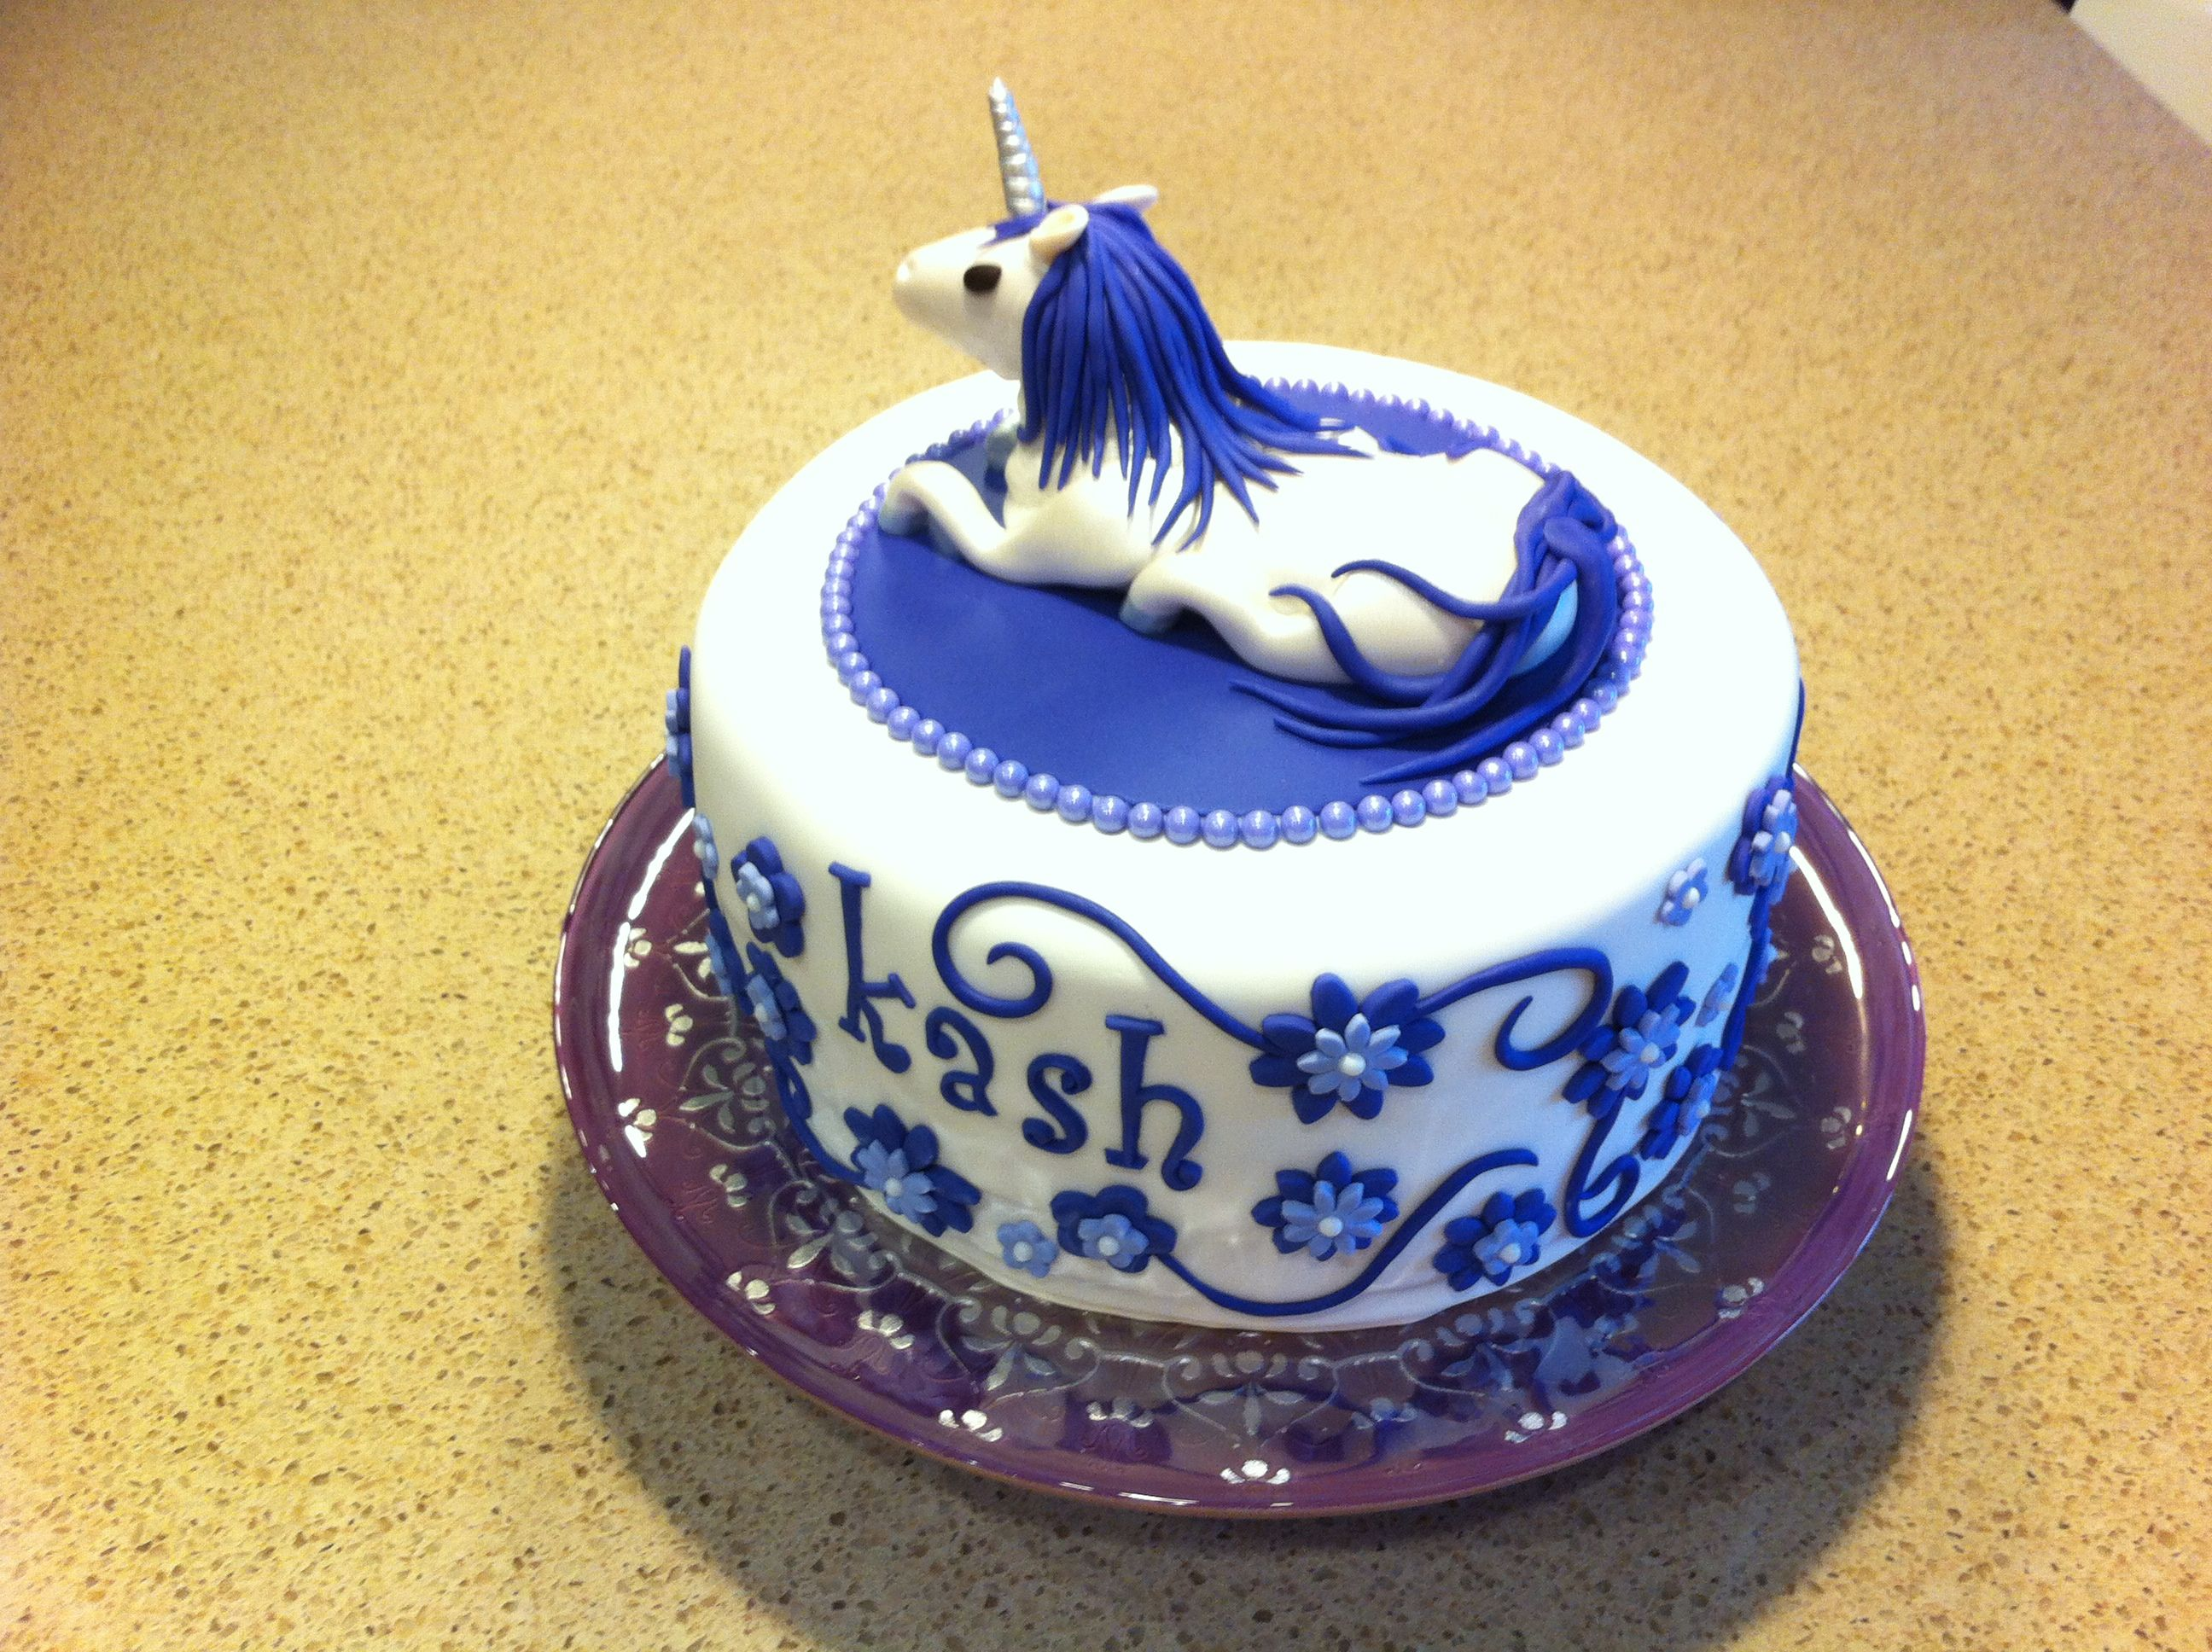 Birthday cake for a 12 year old girl so fun birthday